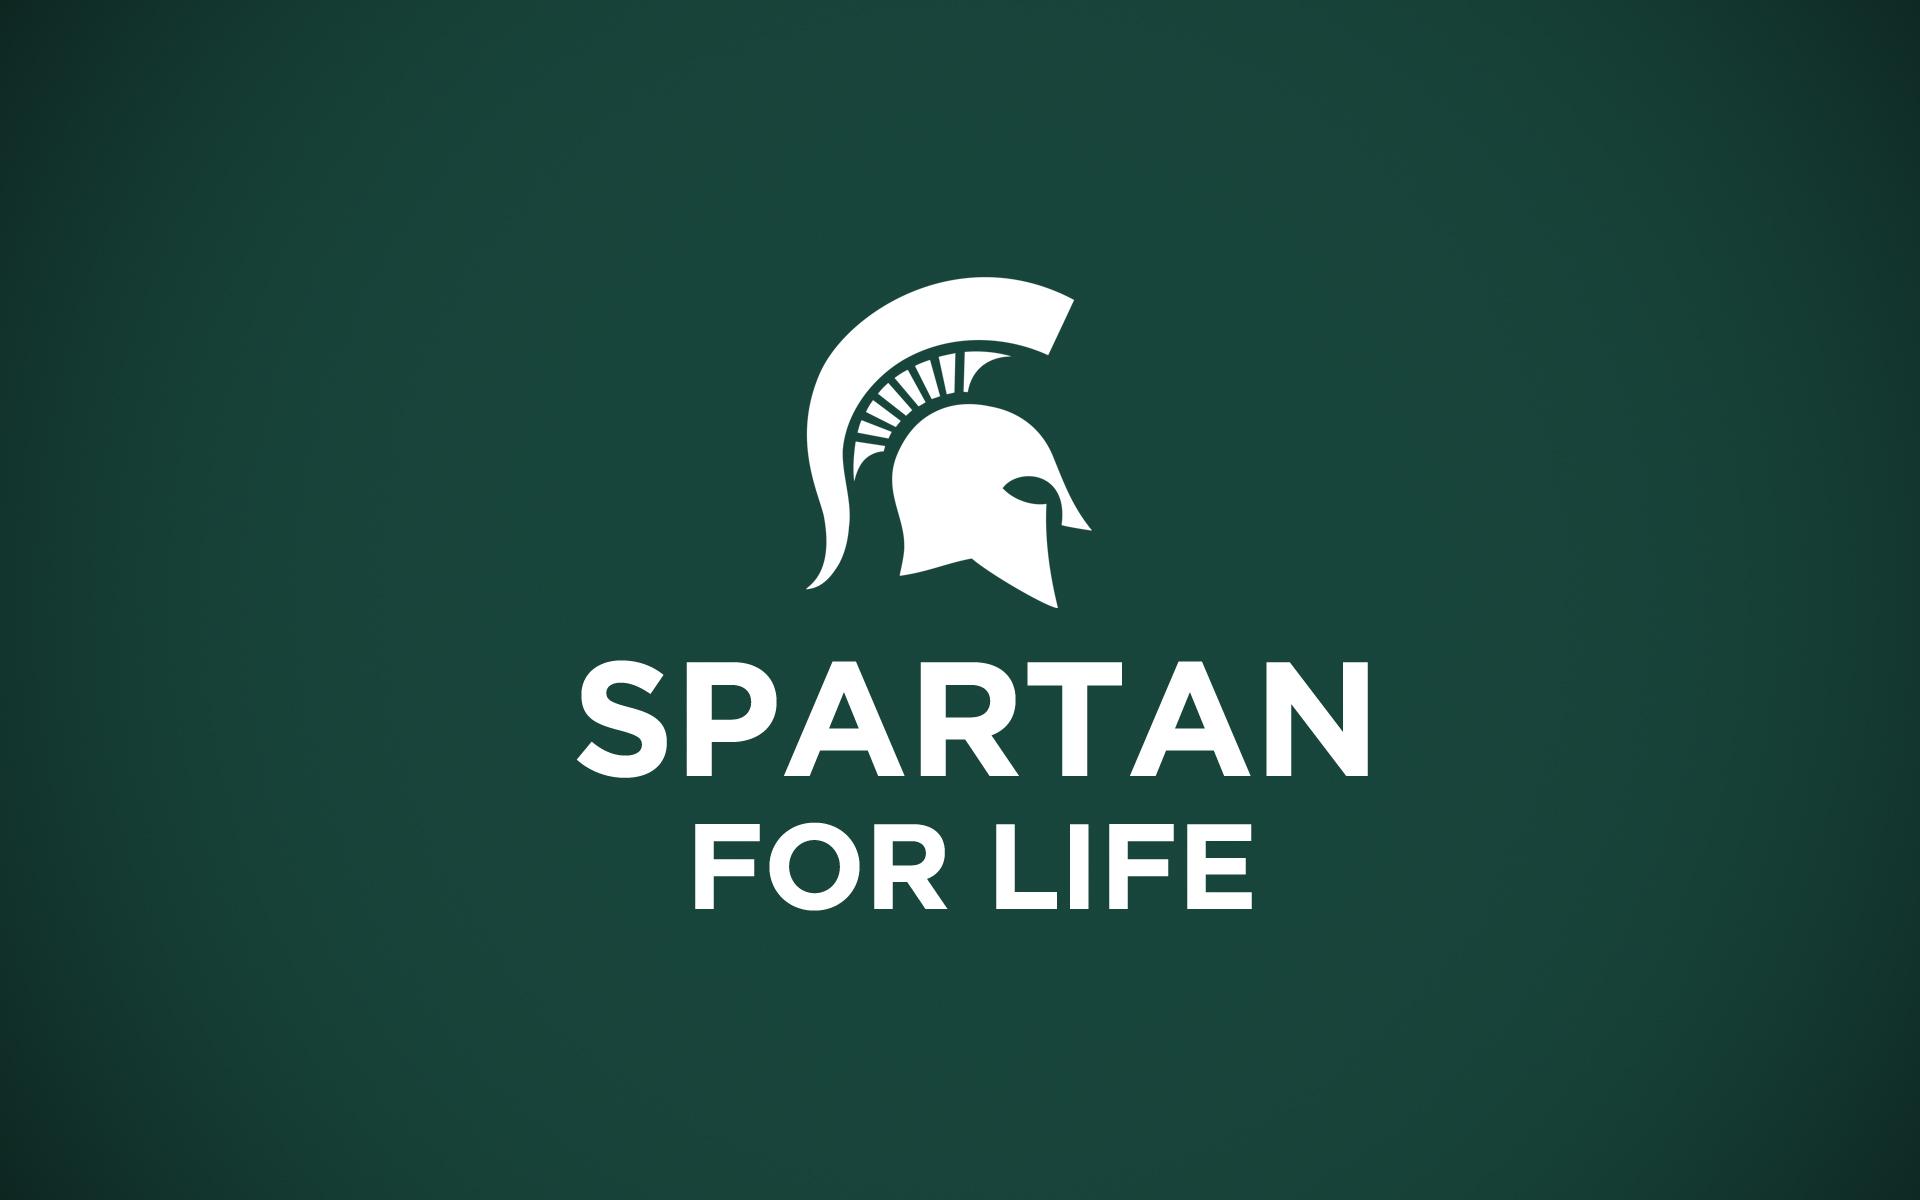 Spartan Helmet Wallpaper Hd Spartan for life 1920x1200